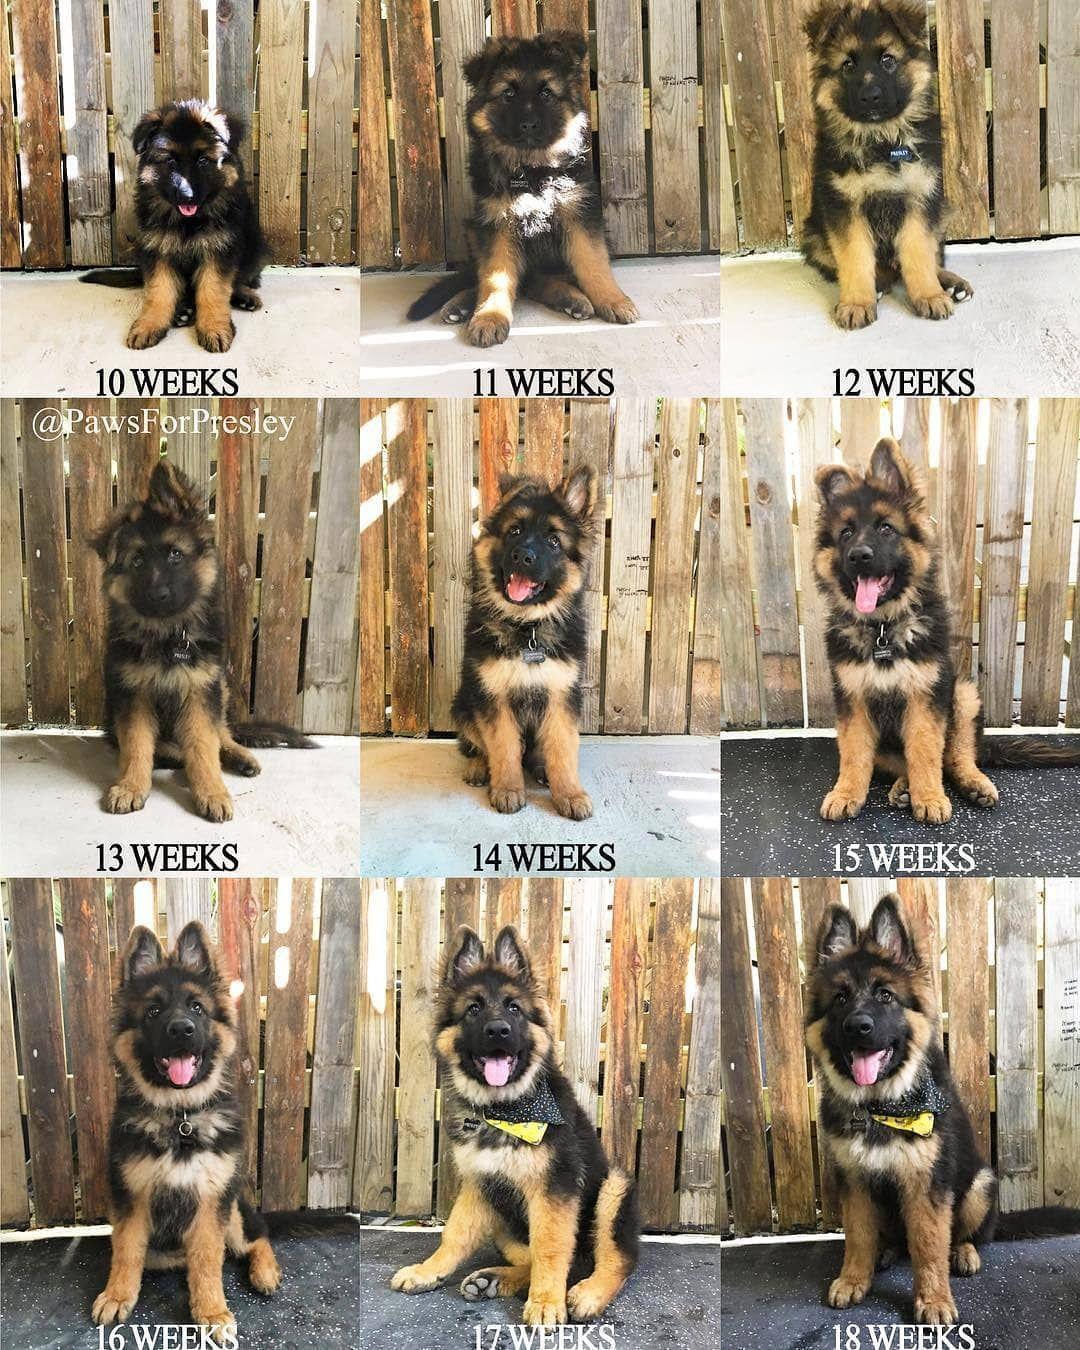 German Shepherd Dog Gsd On Instagram They Grow Up So Fast Follow Presley Pawsforpresl In 2020 Shepherd Puppies German Shepherd Dogs German Shepard Puppies